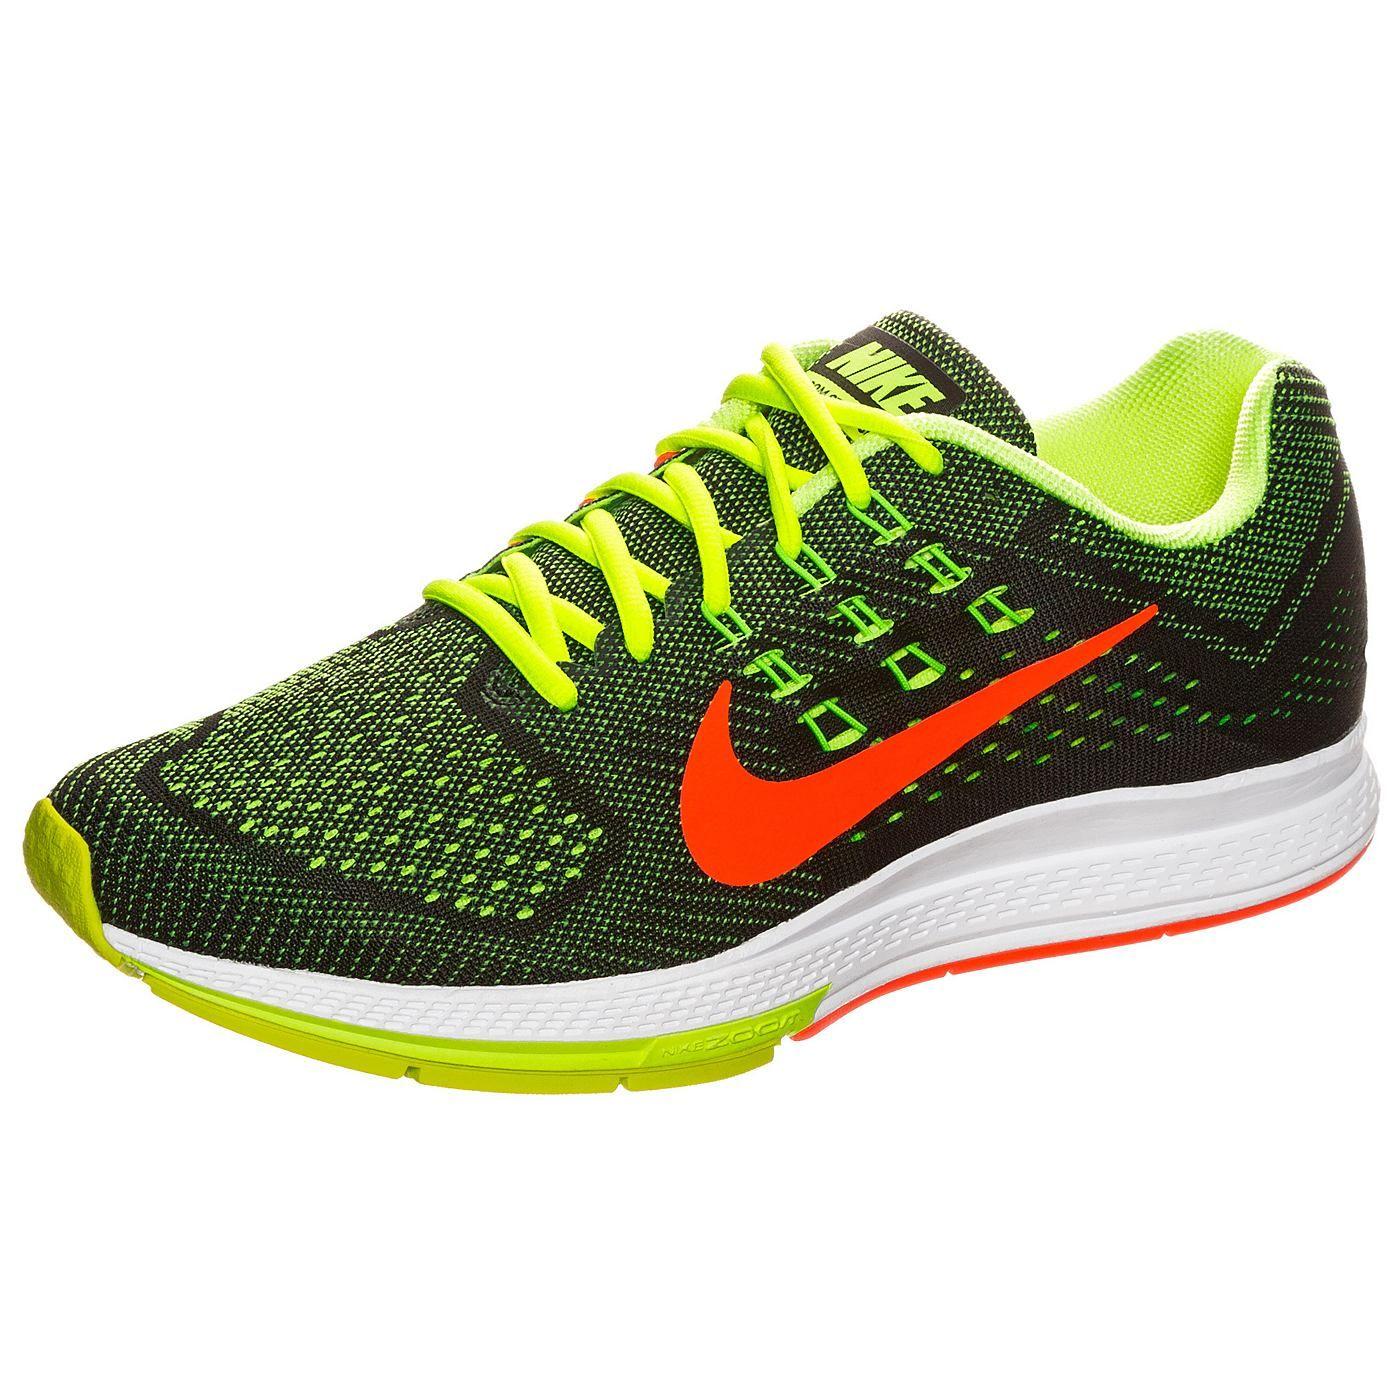 Nike »AIR ZOOM RESISTANCE« Tennisschuh | Produktkatalog